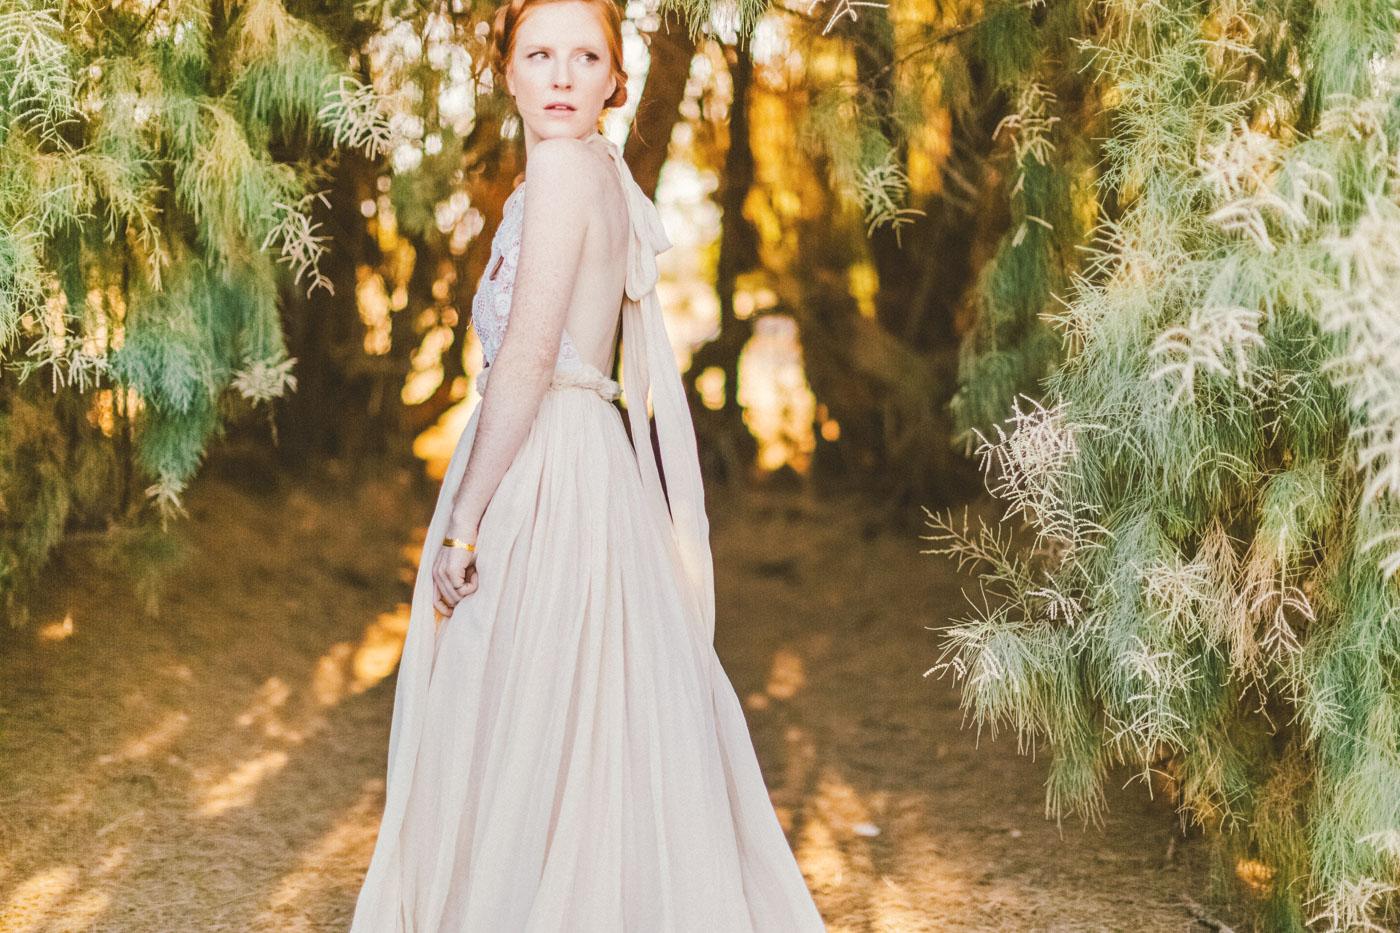 Stunning Maui wedding photographer Joshua tree bridal inspiration